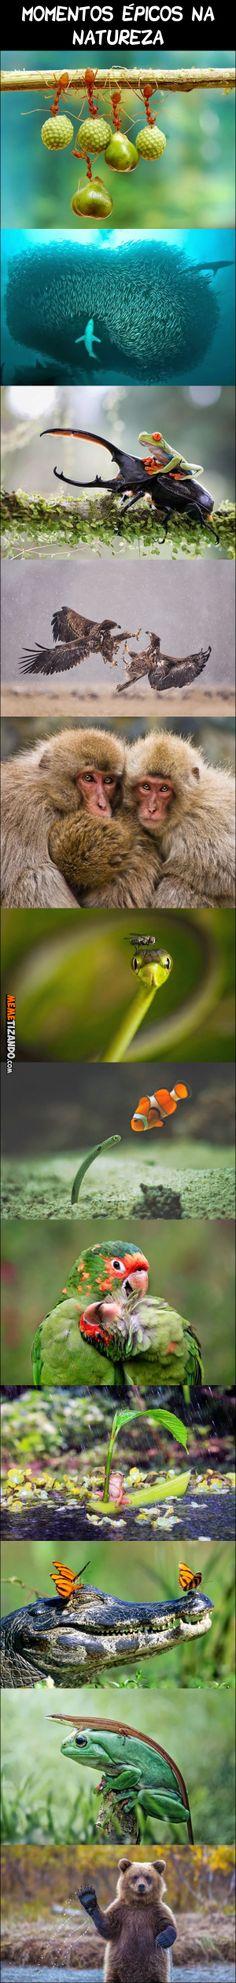 Momentos épicos na natureza